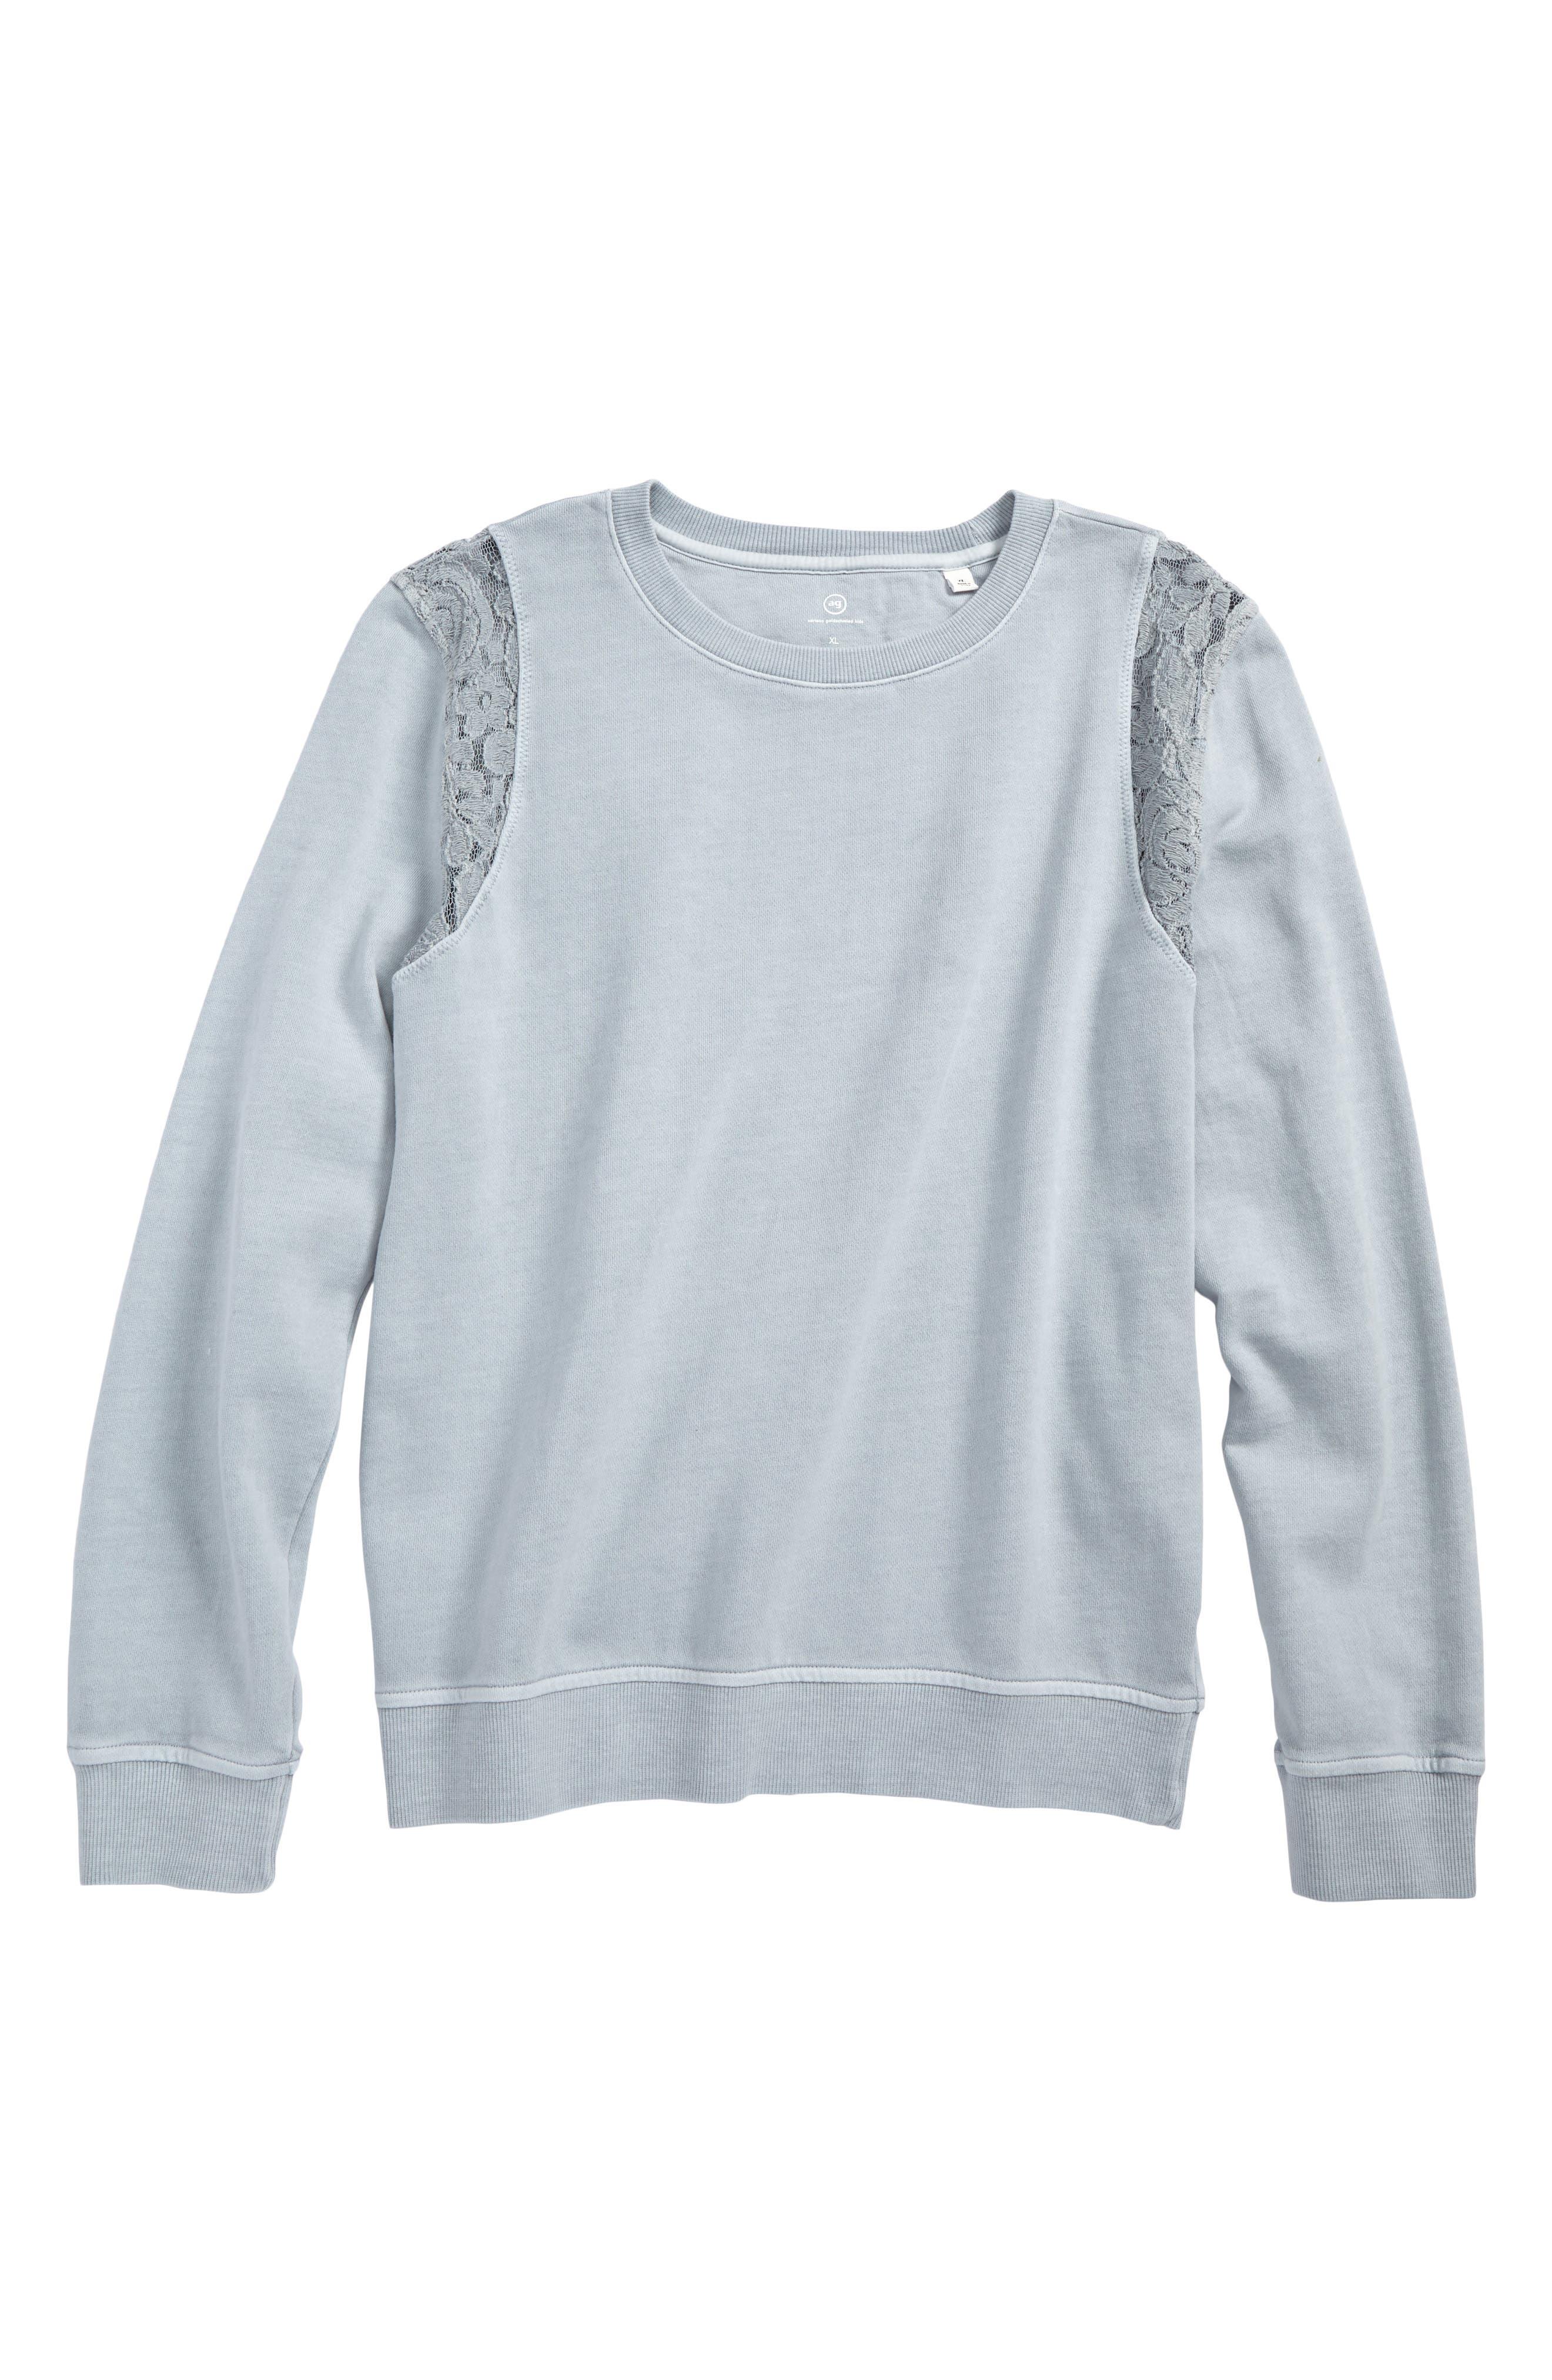 Main Image - ag adriano goldschmied kids Lace Sweatshirt (Big Girls)